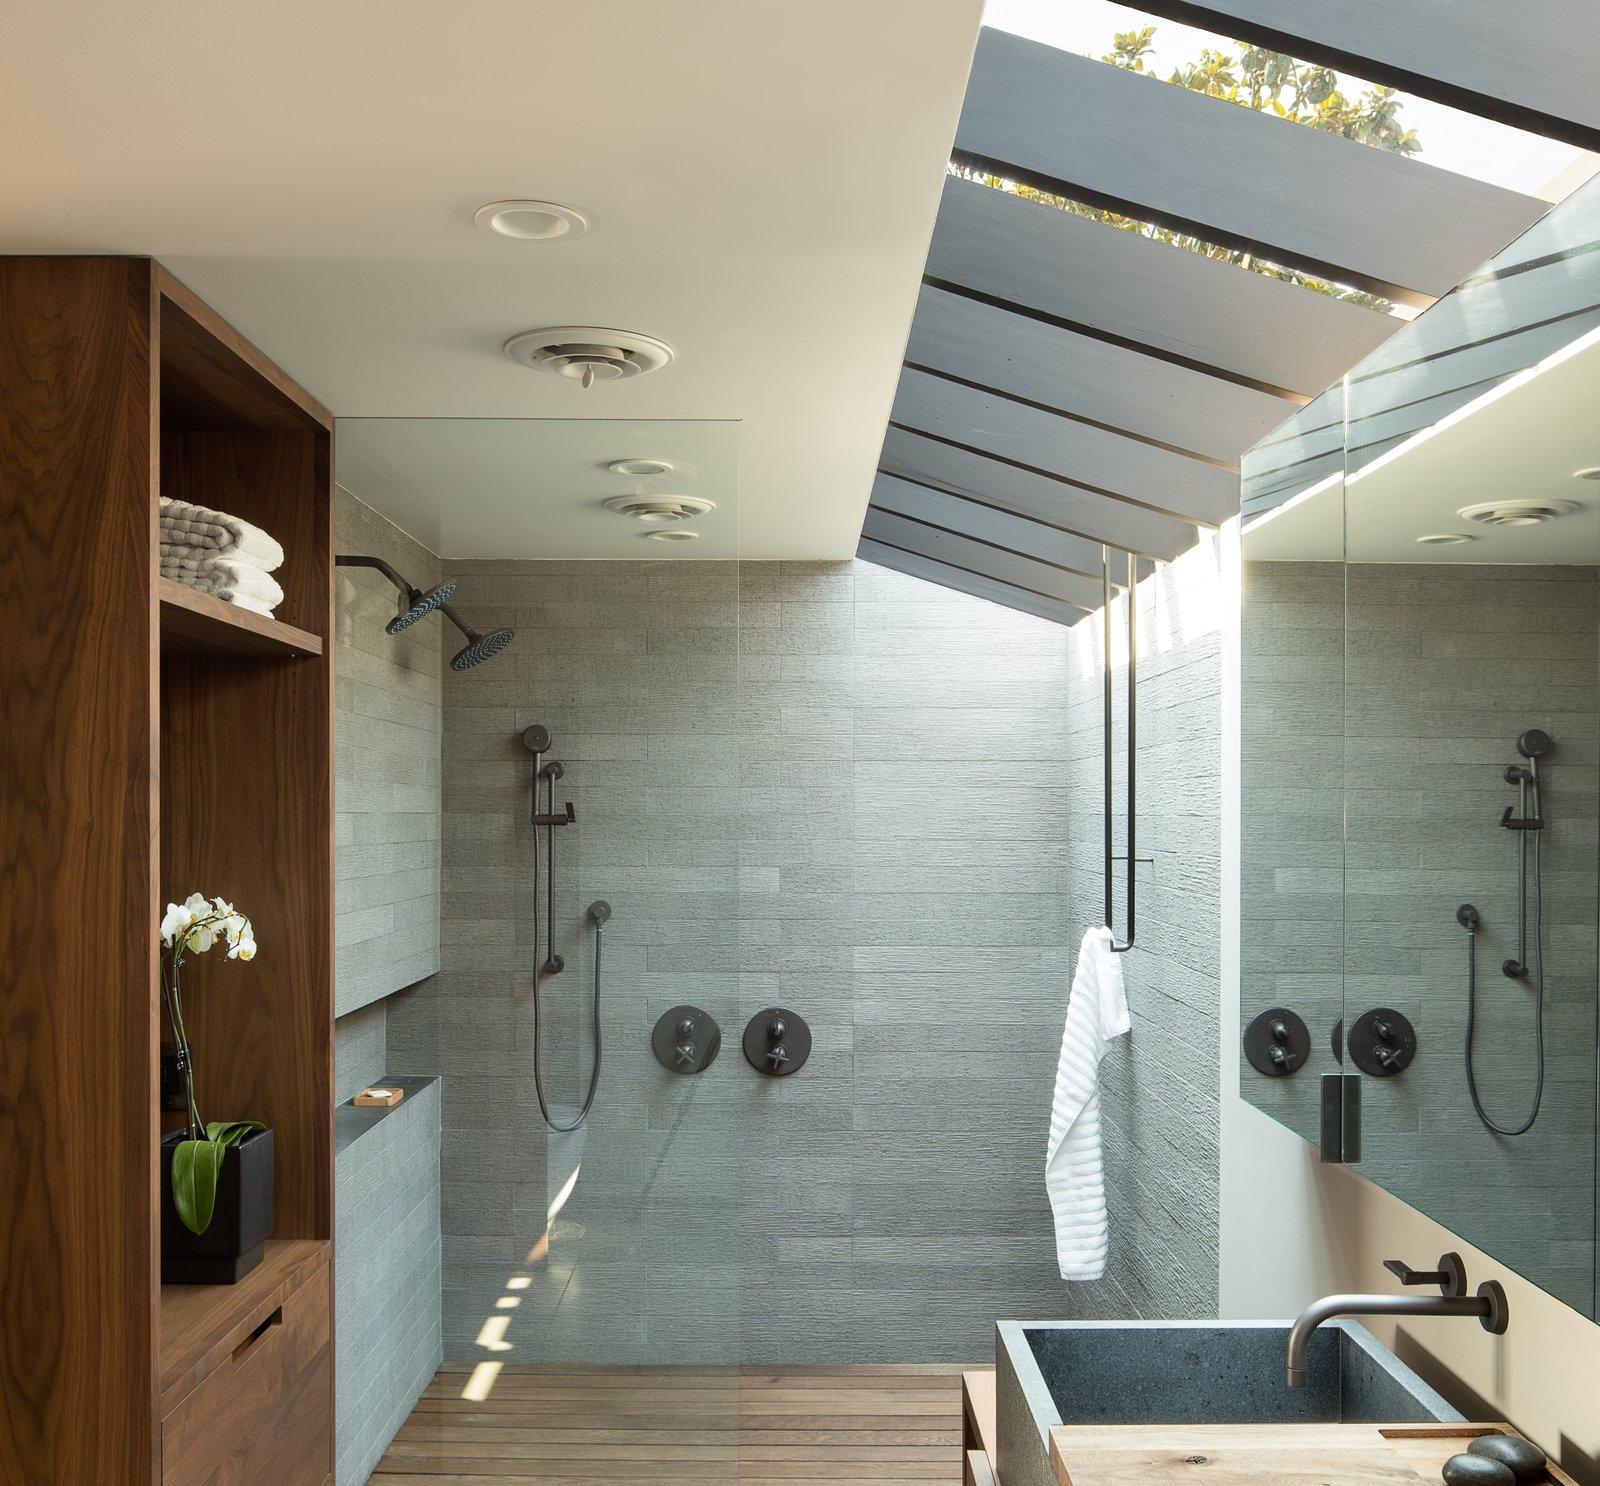 Laurelhurst Residence Tagged: Bath Room, Wood Counter, and Stone Tile Wall.  Laurelhurst Residence by mw|works